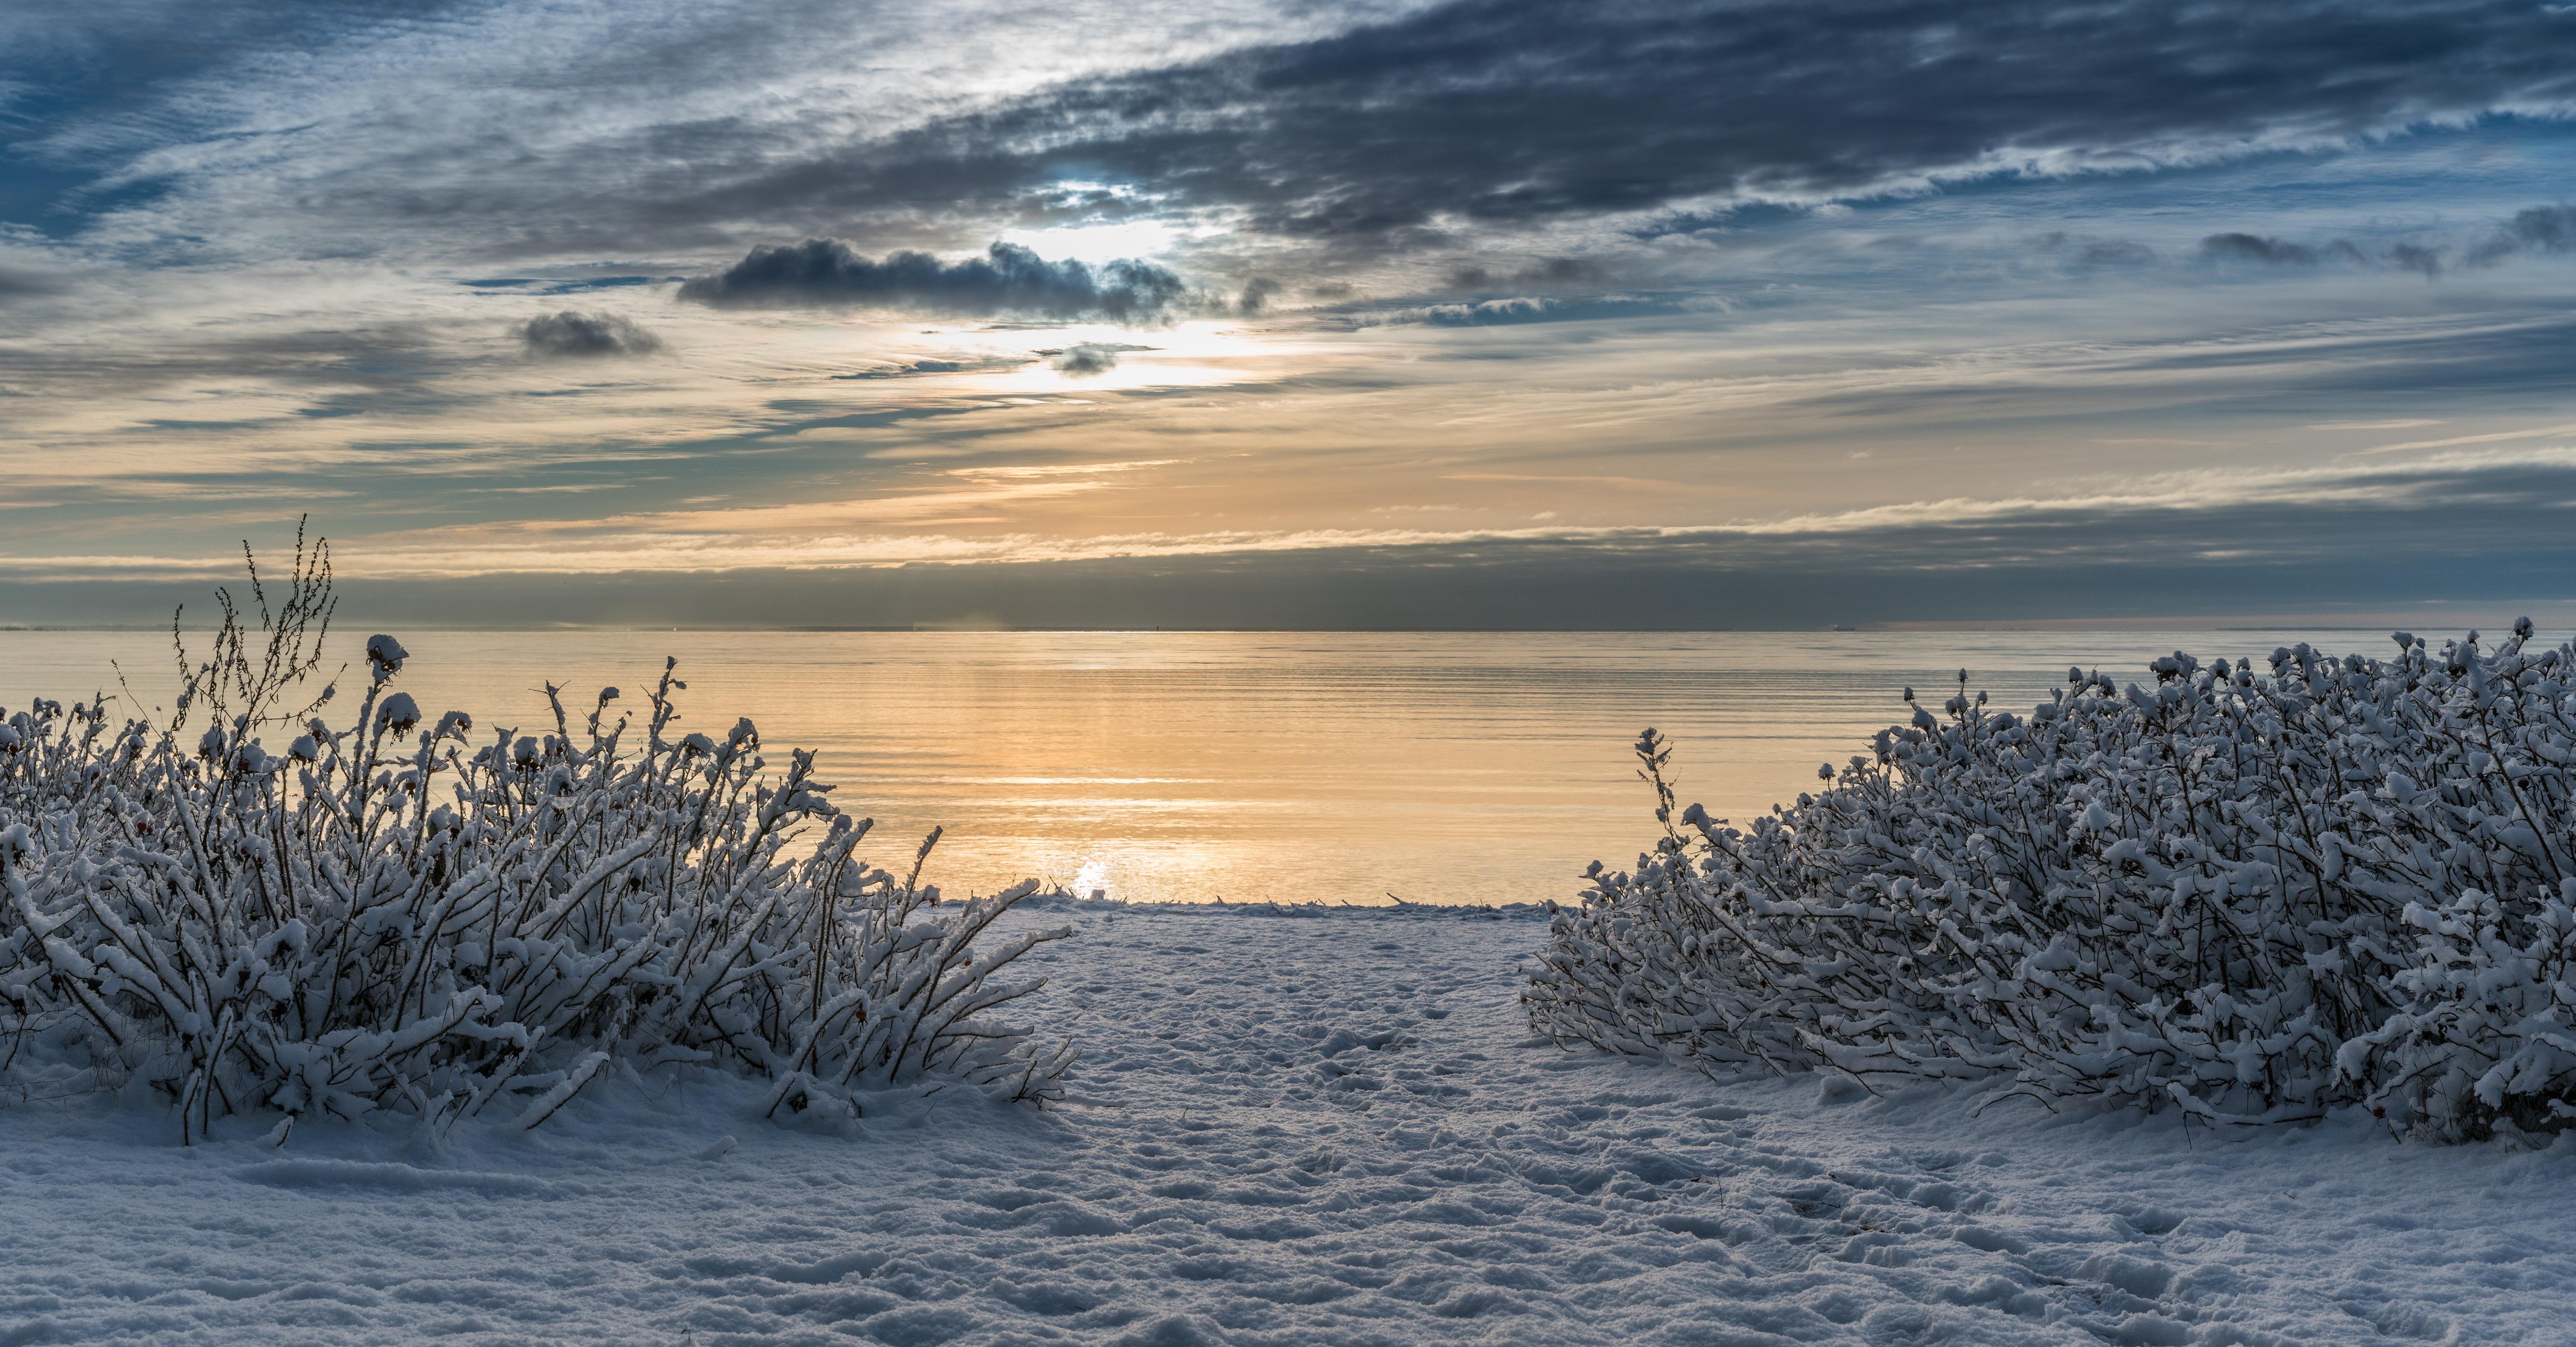 Seashore Photo, Plants, Winter, Weather, Water, HQ Photo